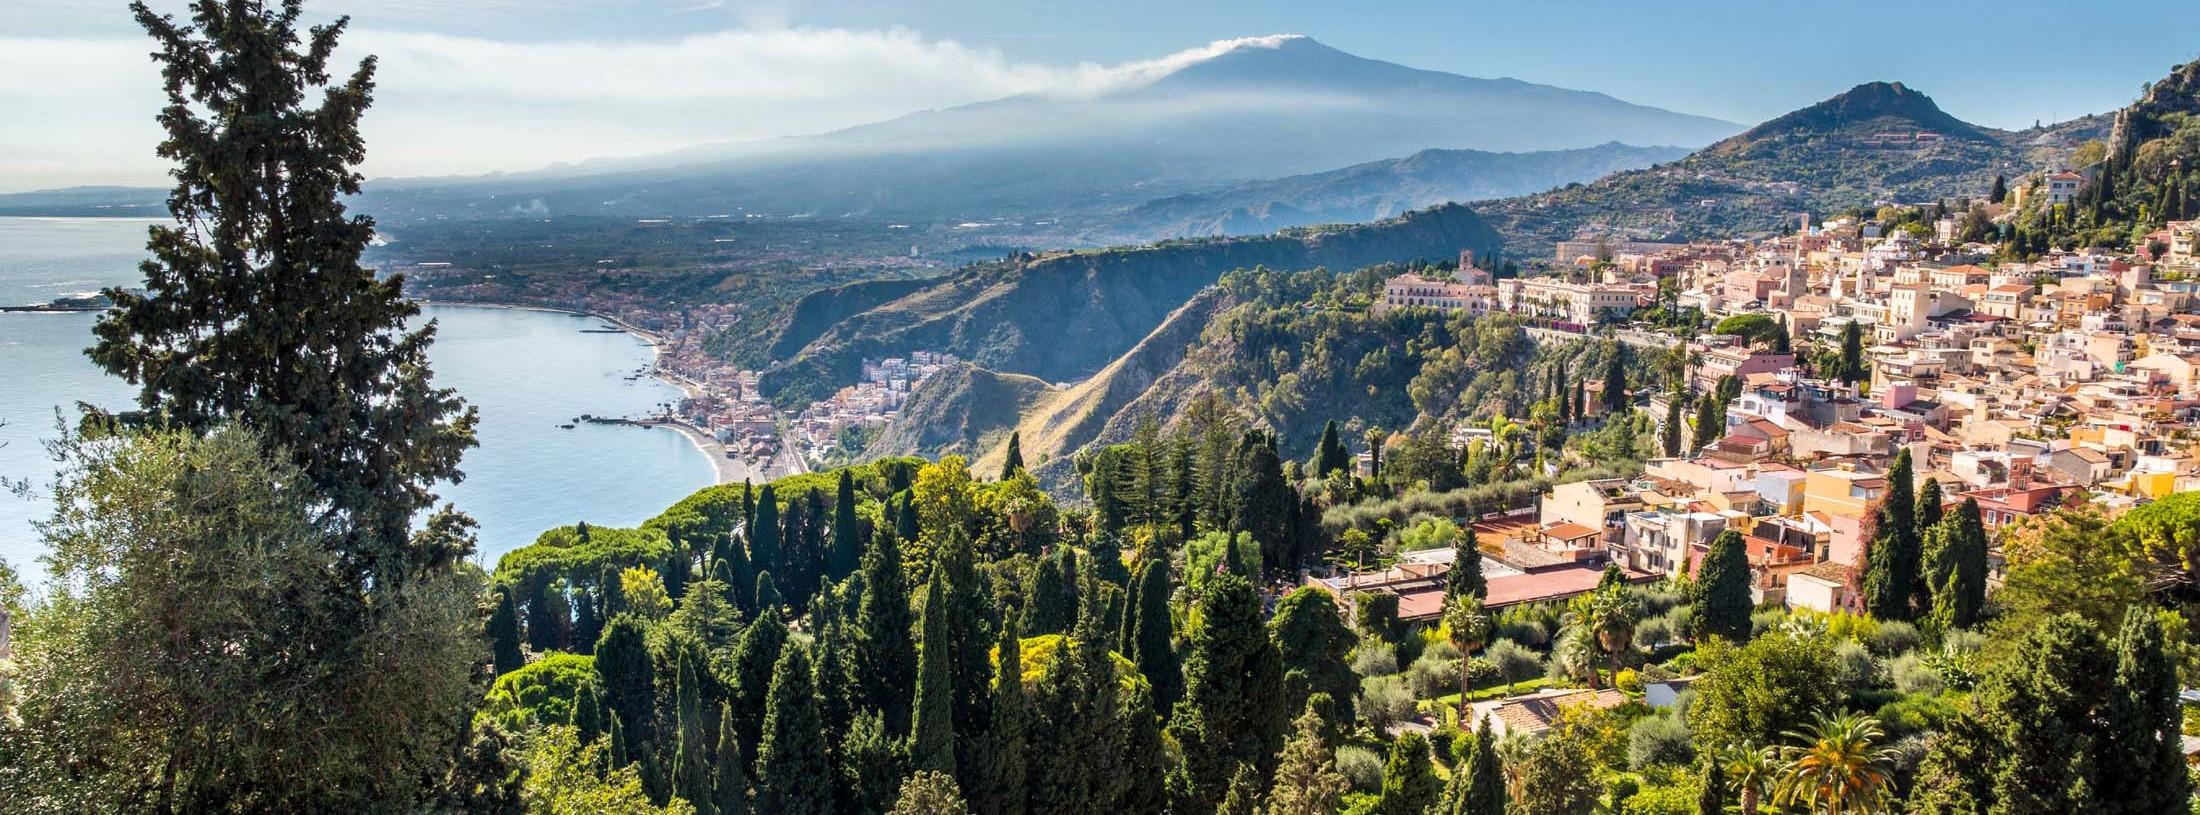 Giardini naxos hotel and accommodation for your holiday for Giardini naxos sicilia